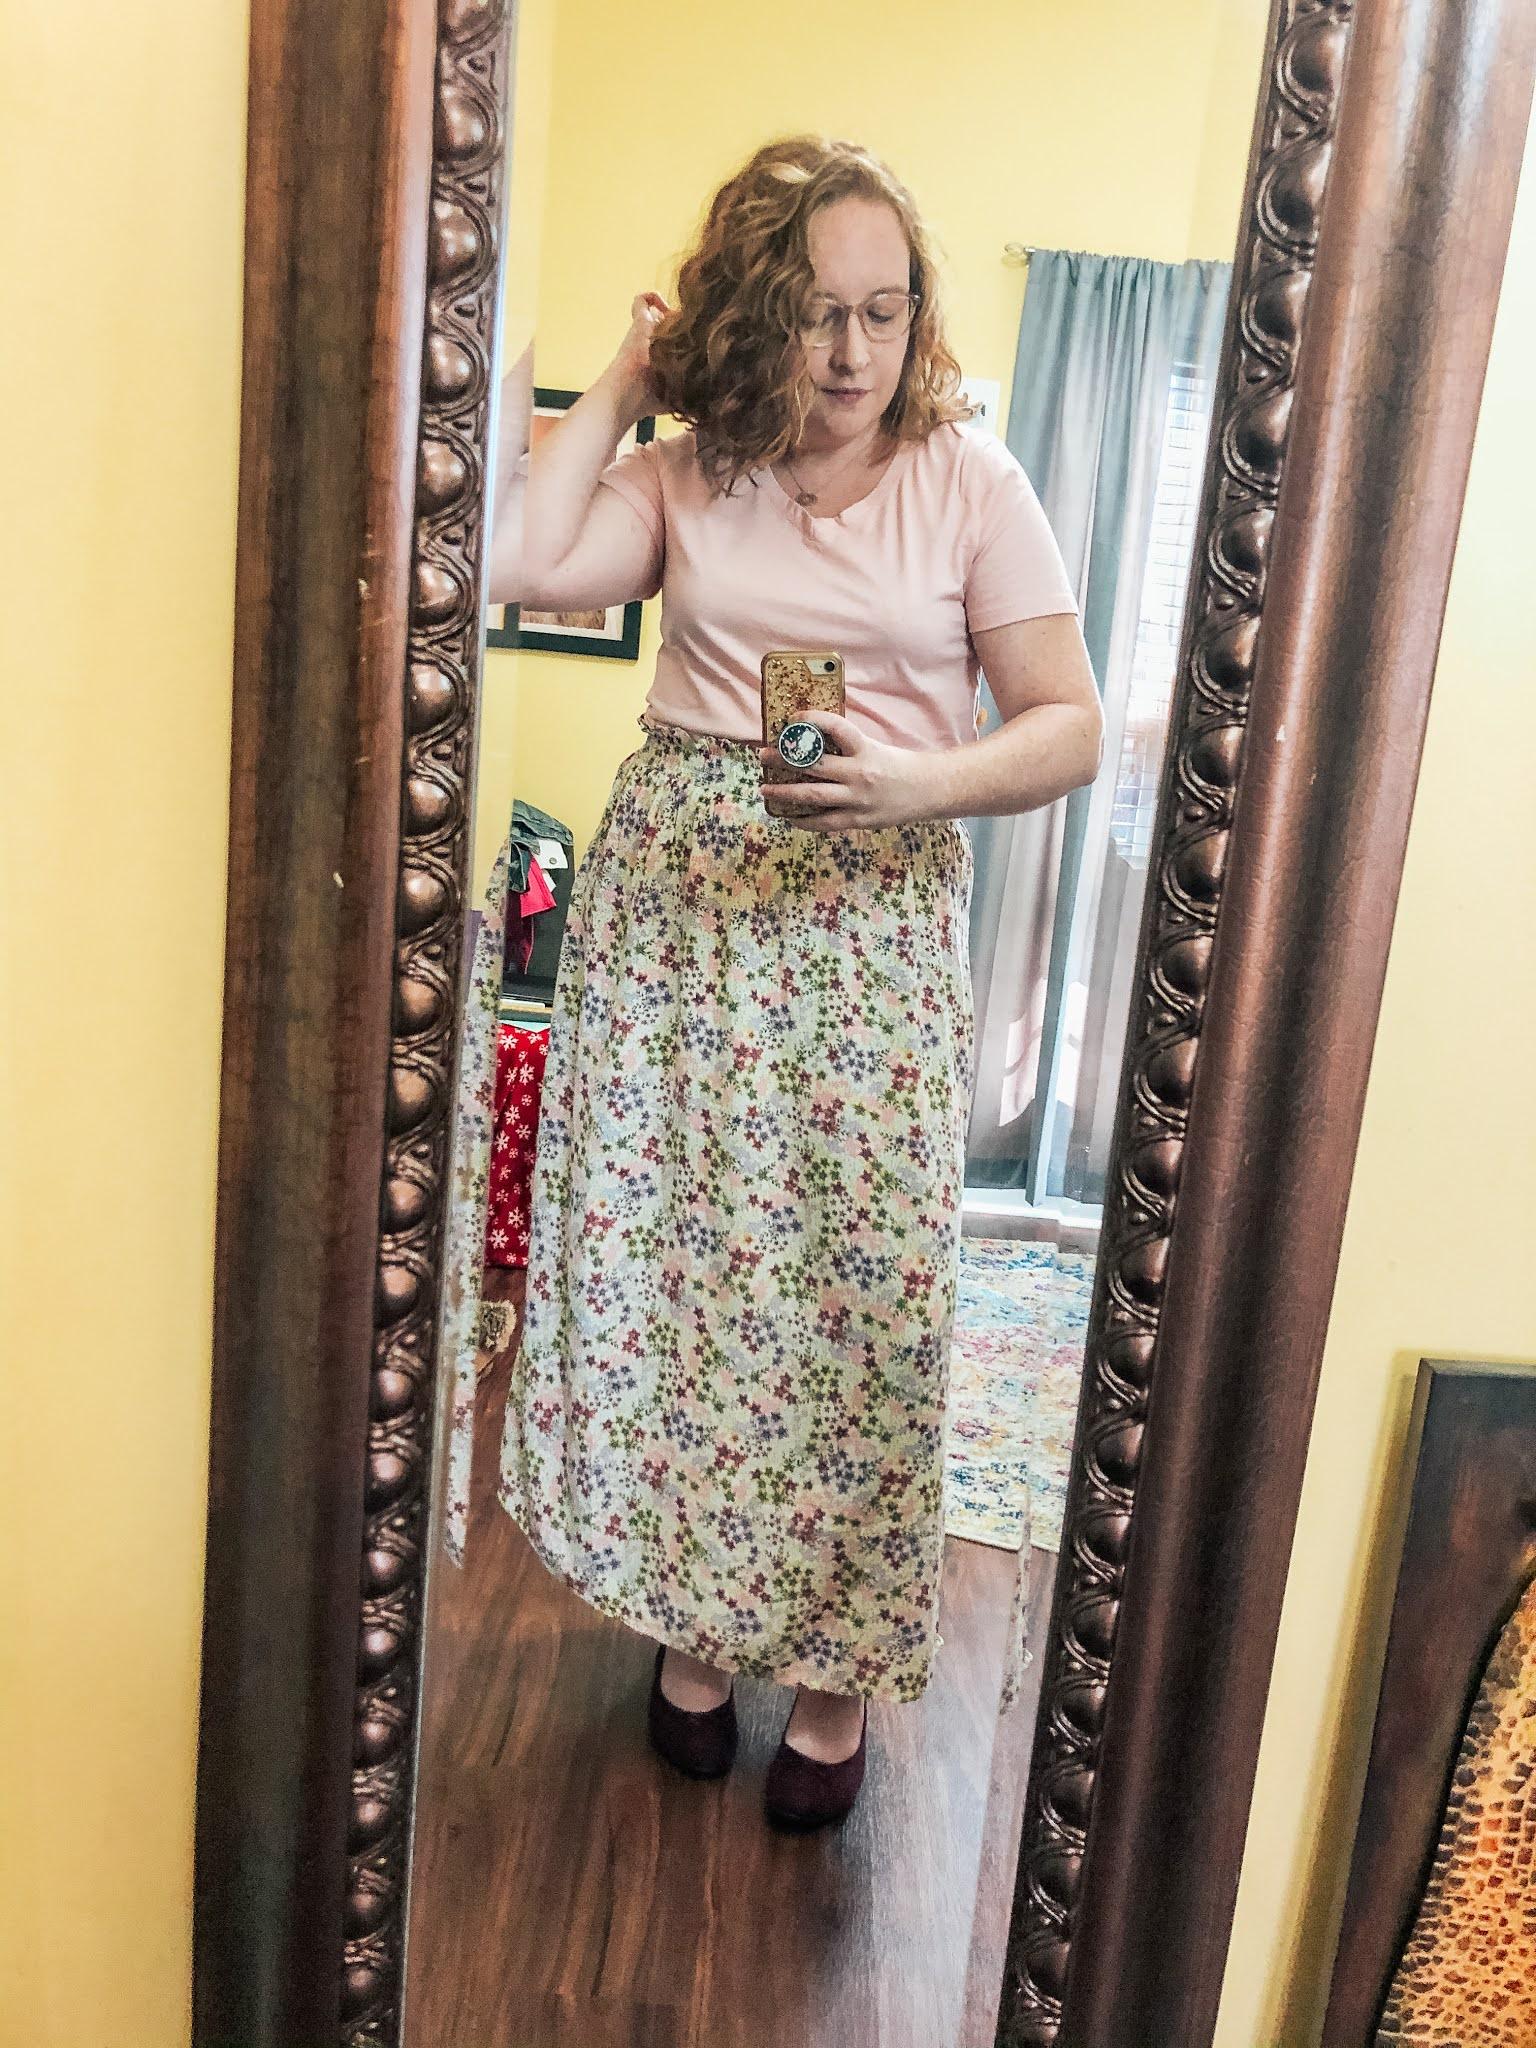 floral-midi-skirt-pink-tshirt-ballet-flats